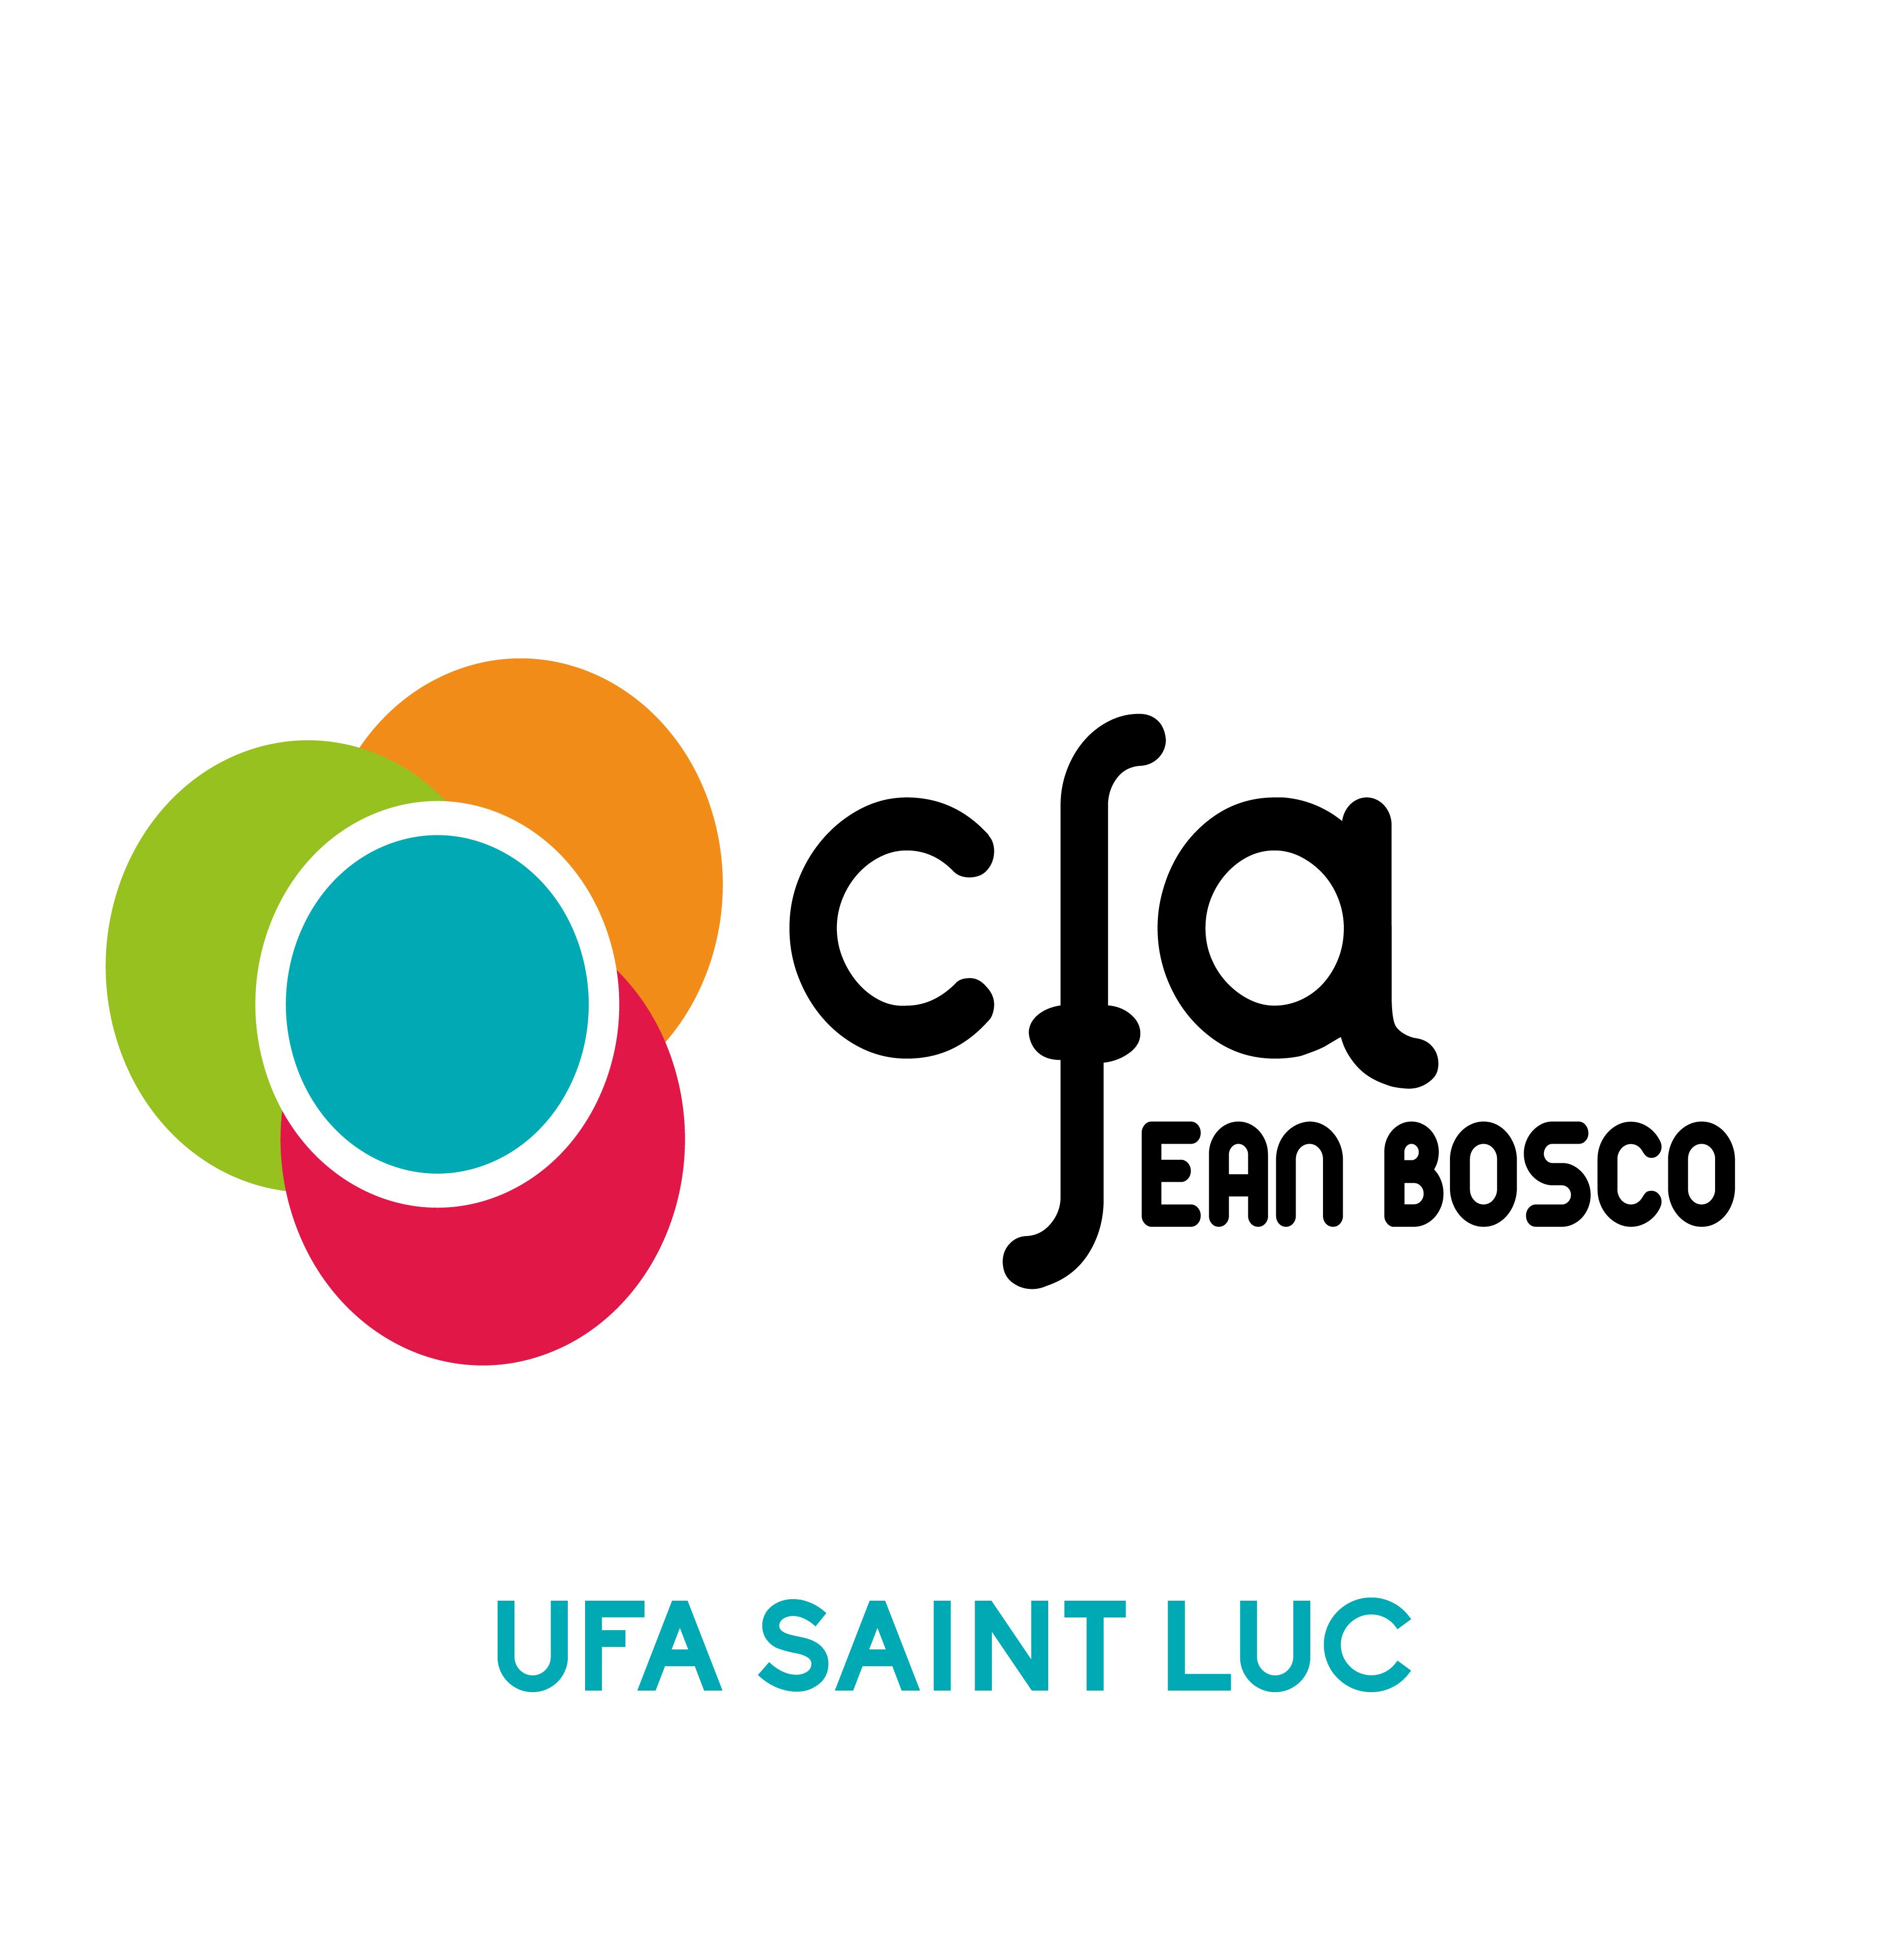 LOGO CFA-SAINT-LUC